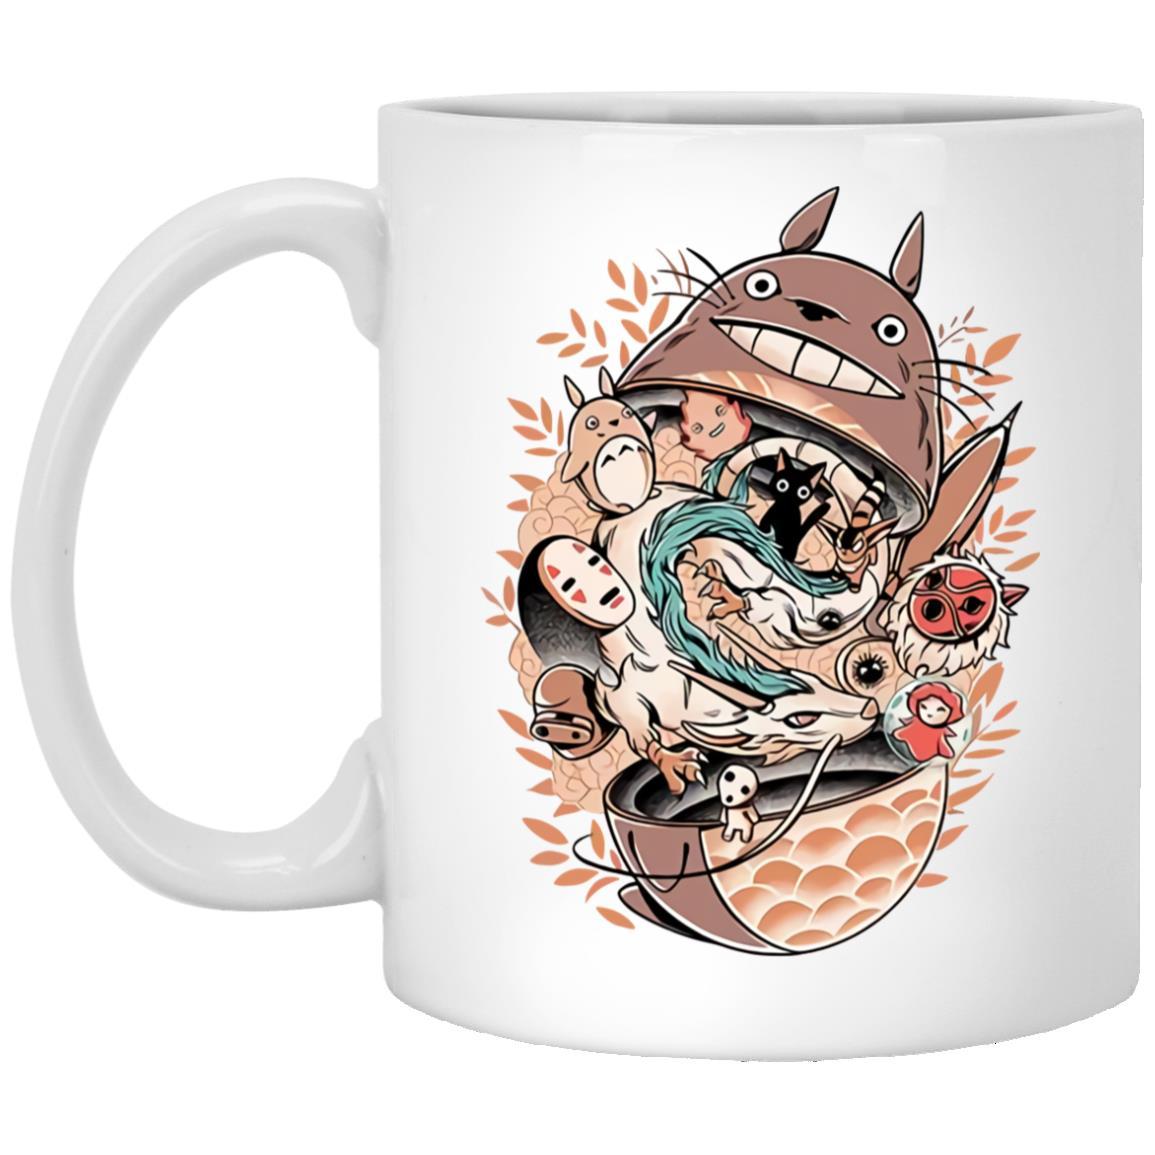 Totoro Daruma and Ghibli Friends Mug